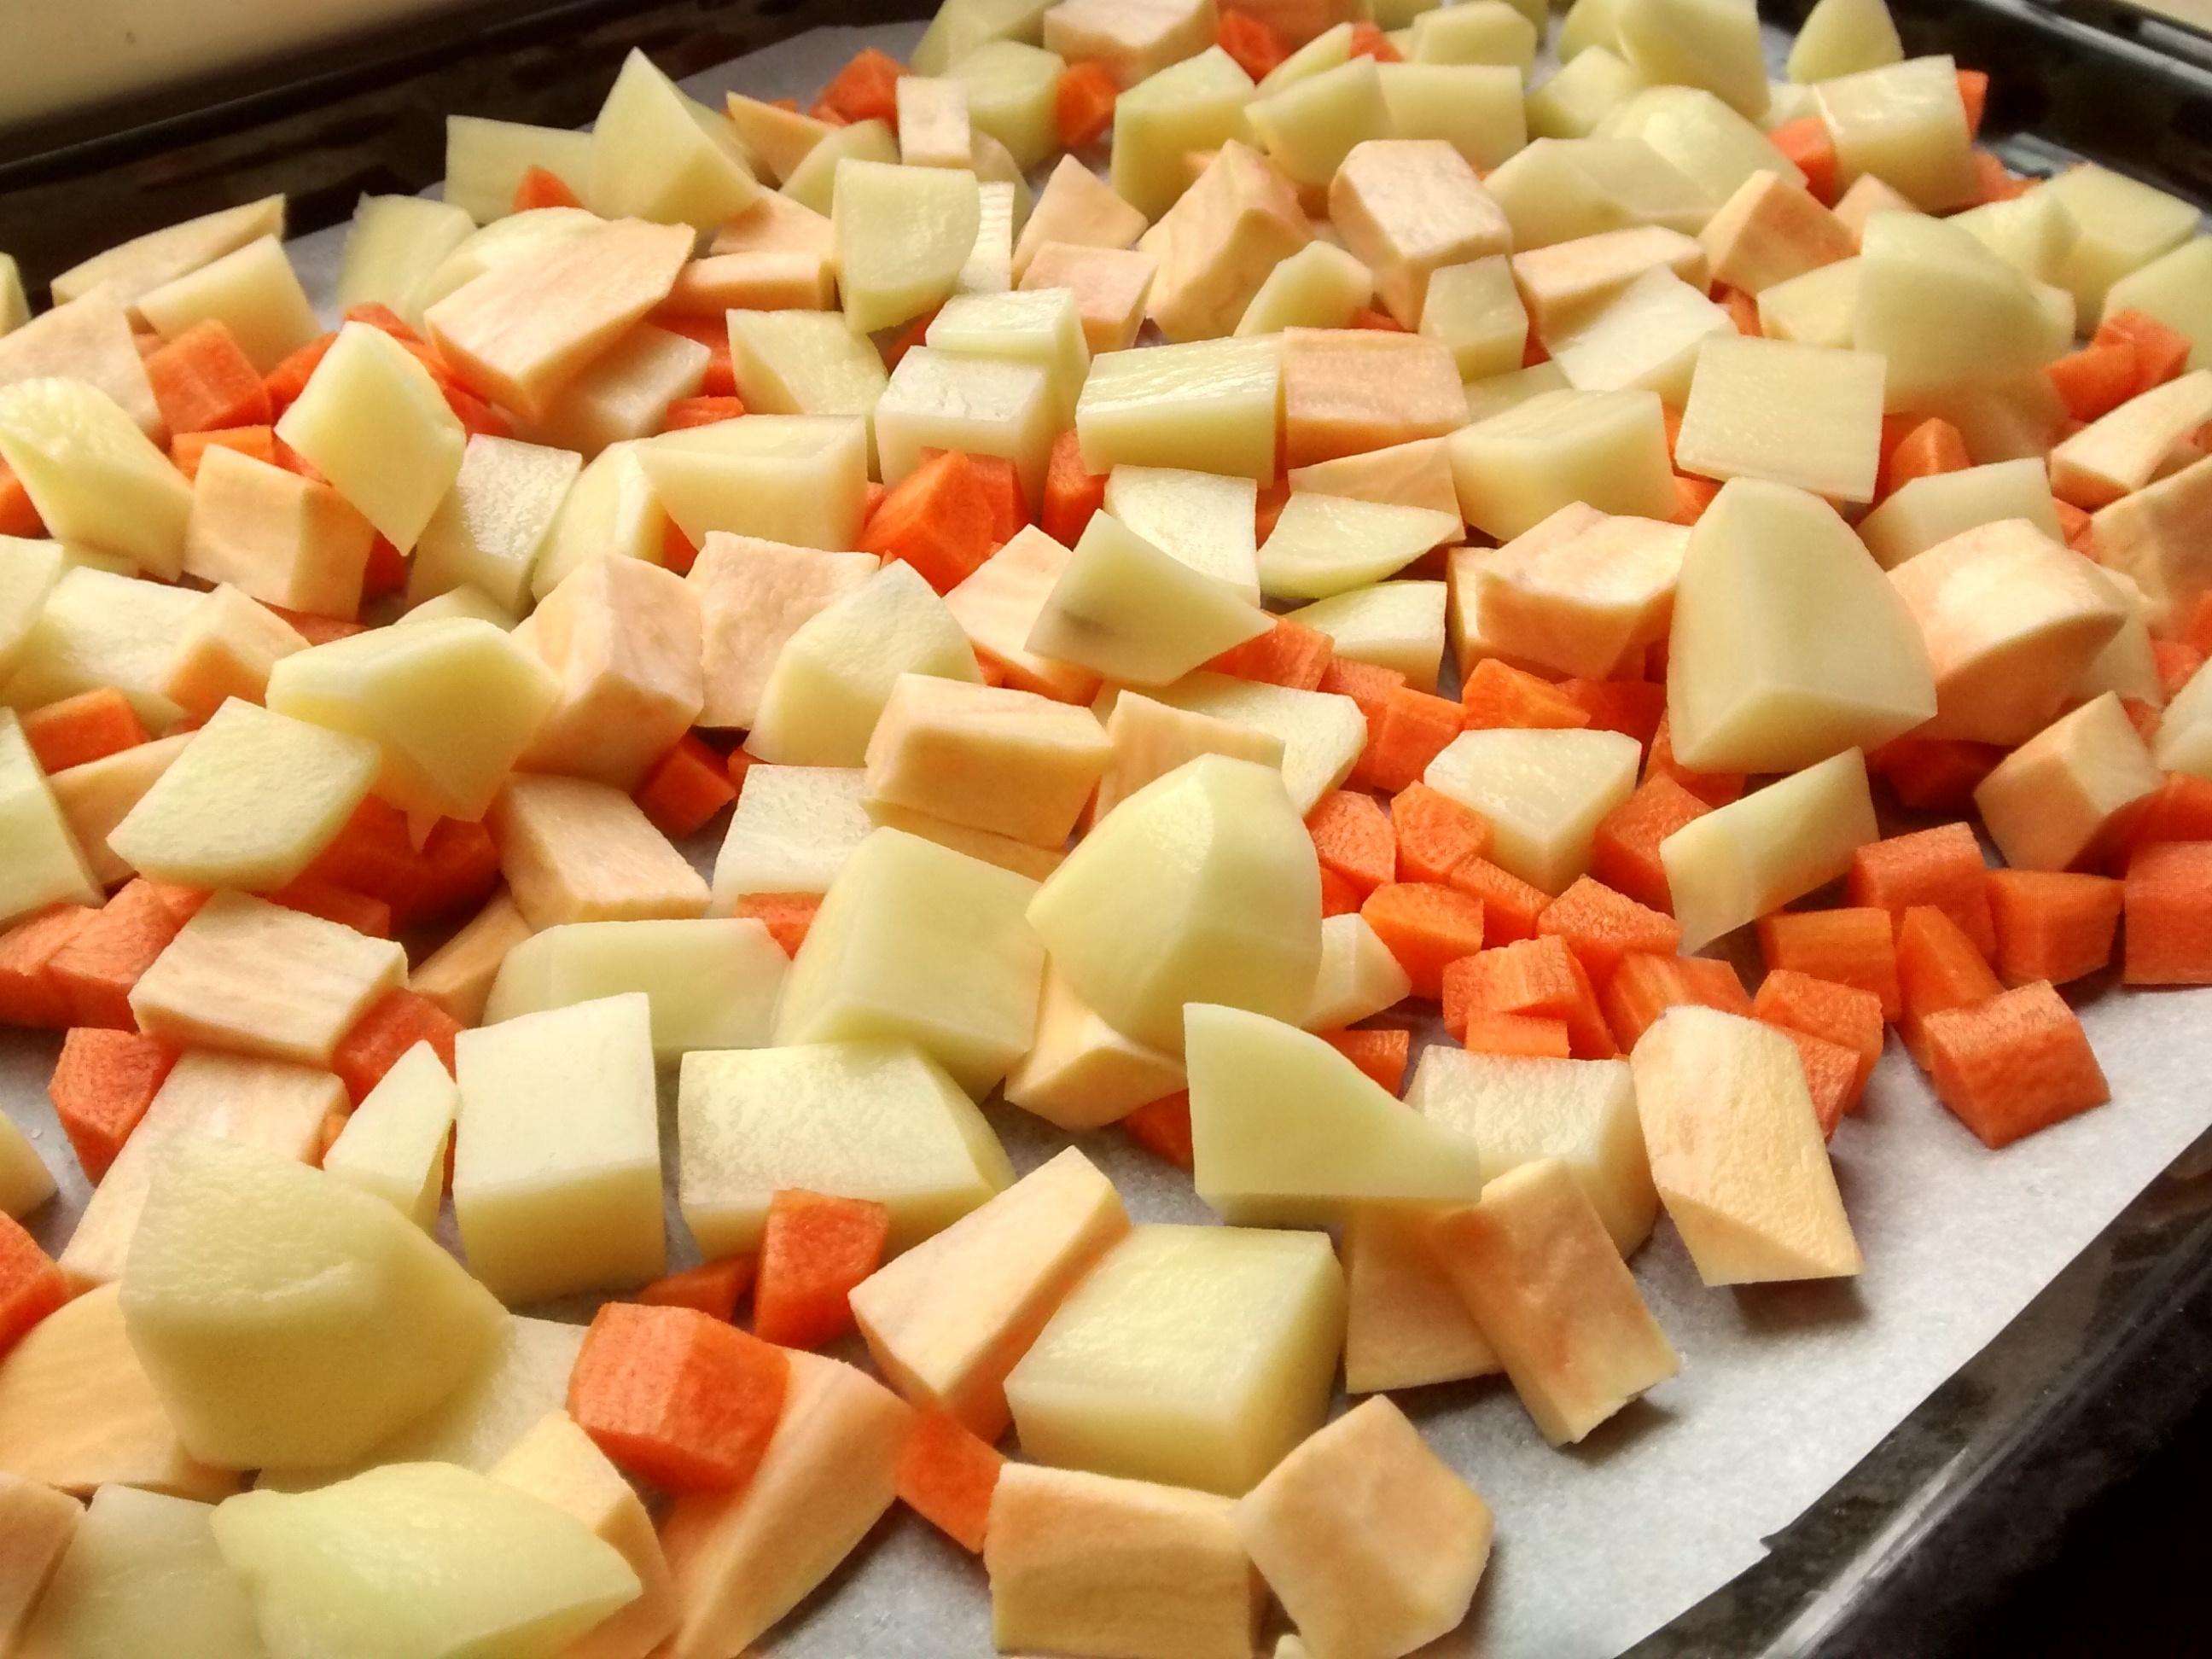 iguaria-cortar-batata-cenoura-cubos